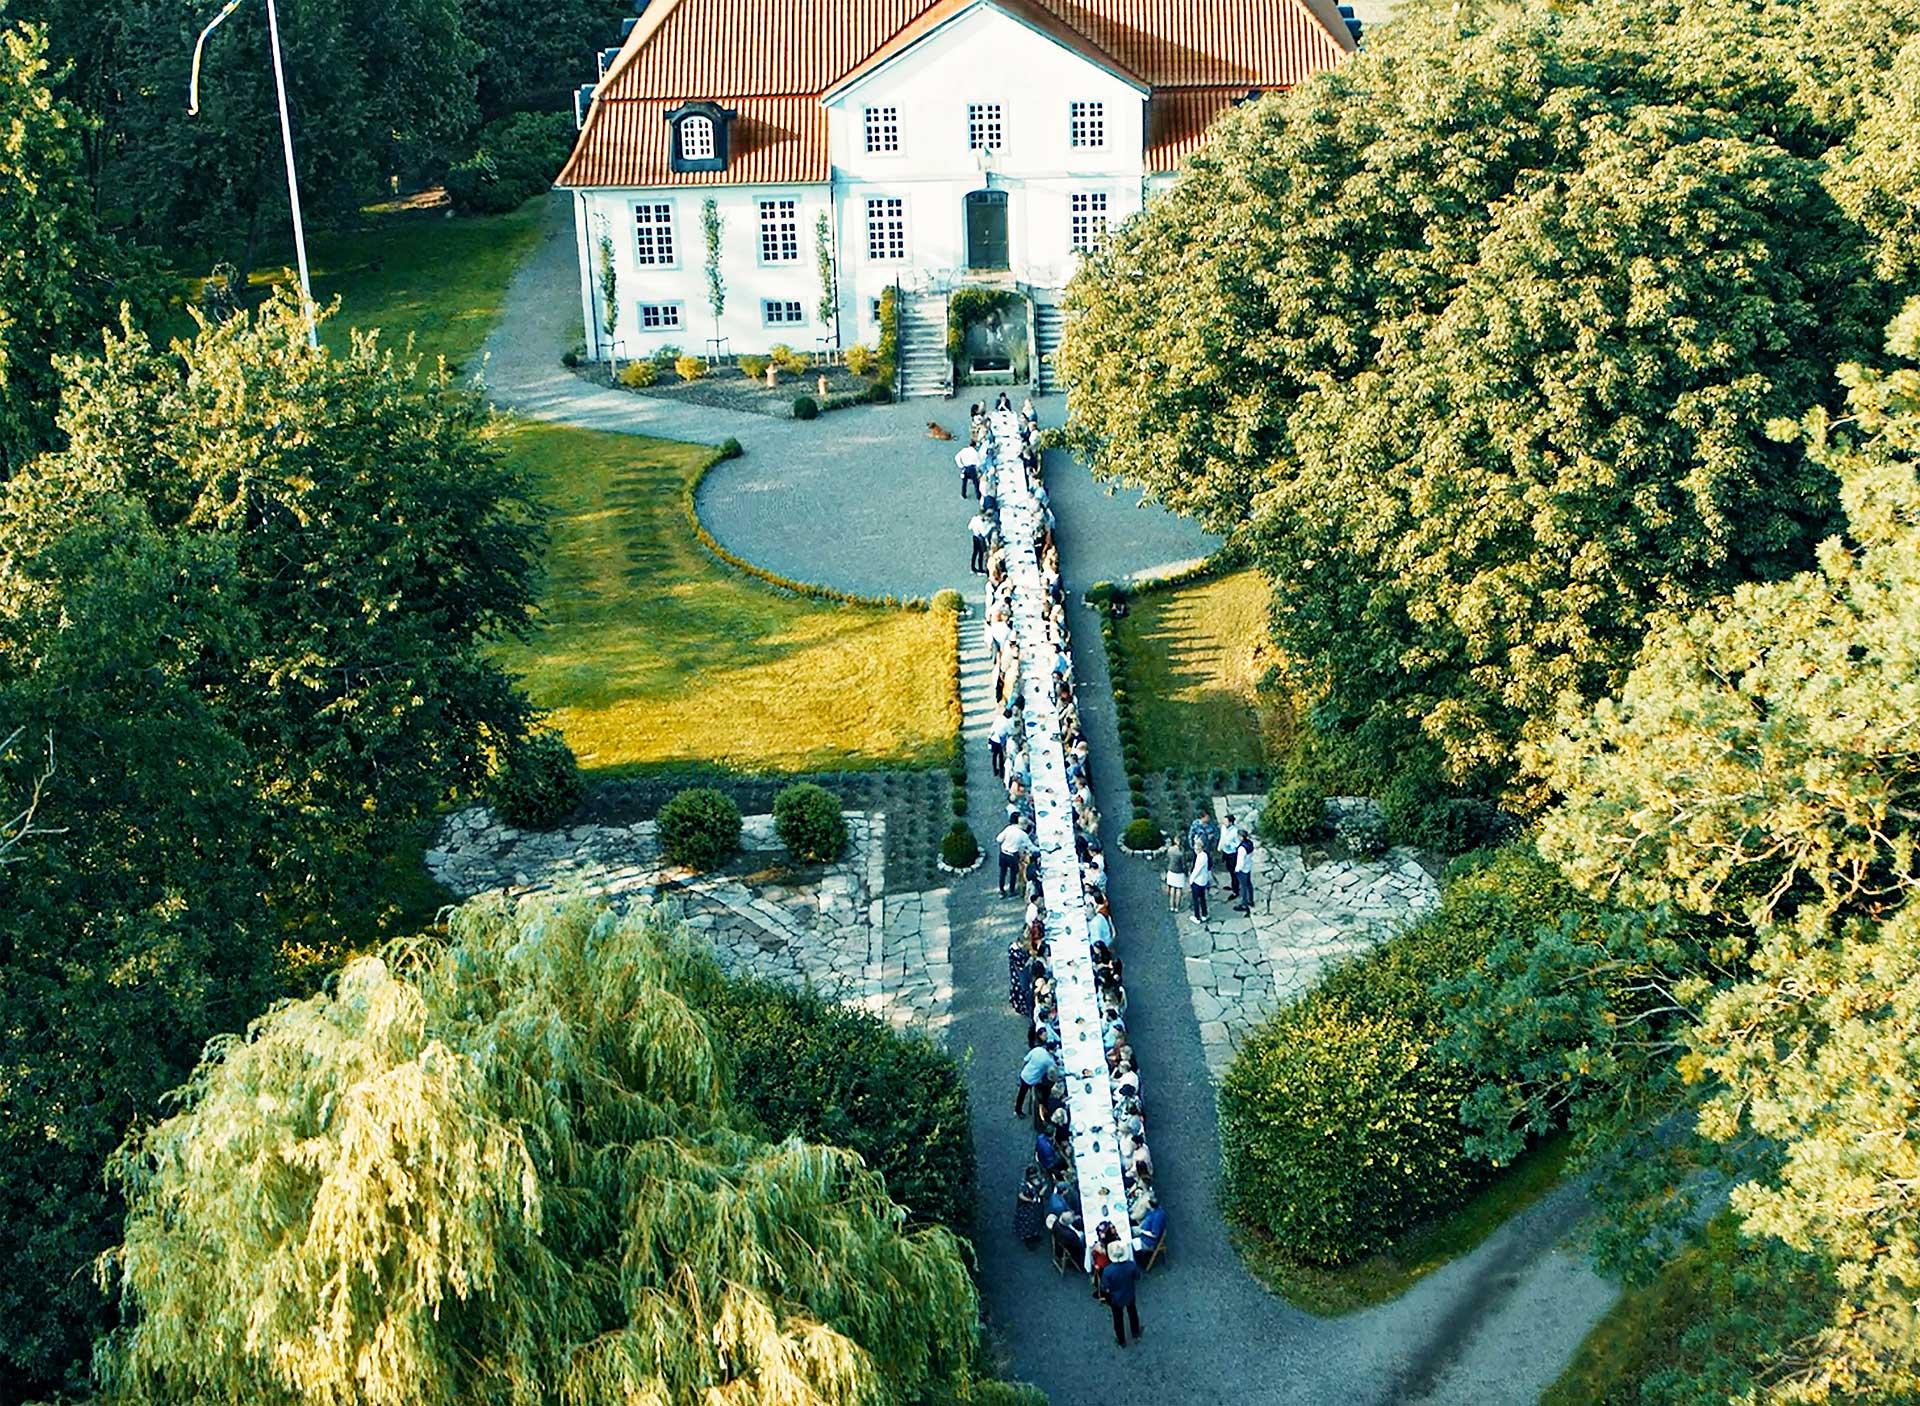 Kaseholm Slott Castle